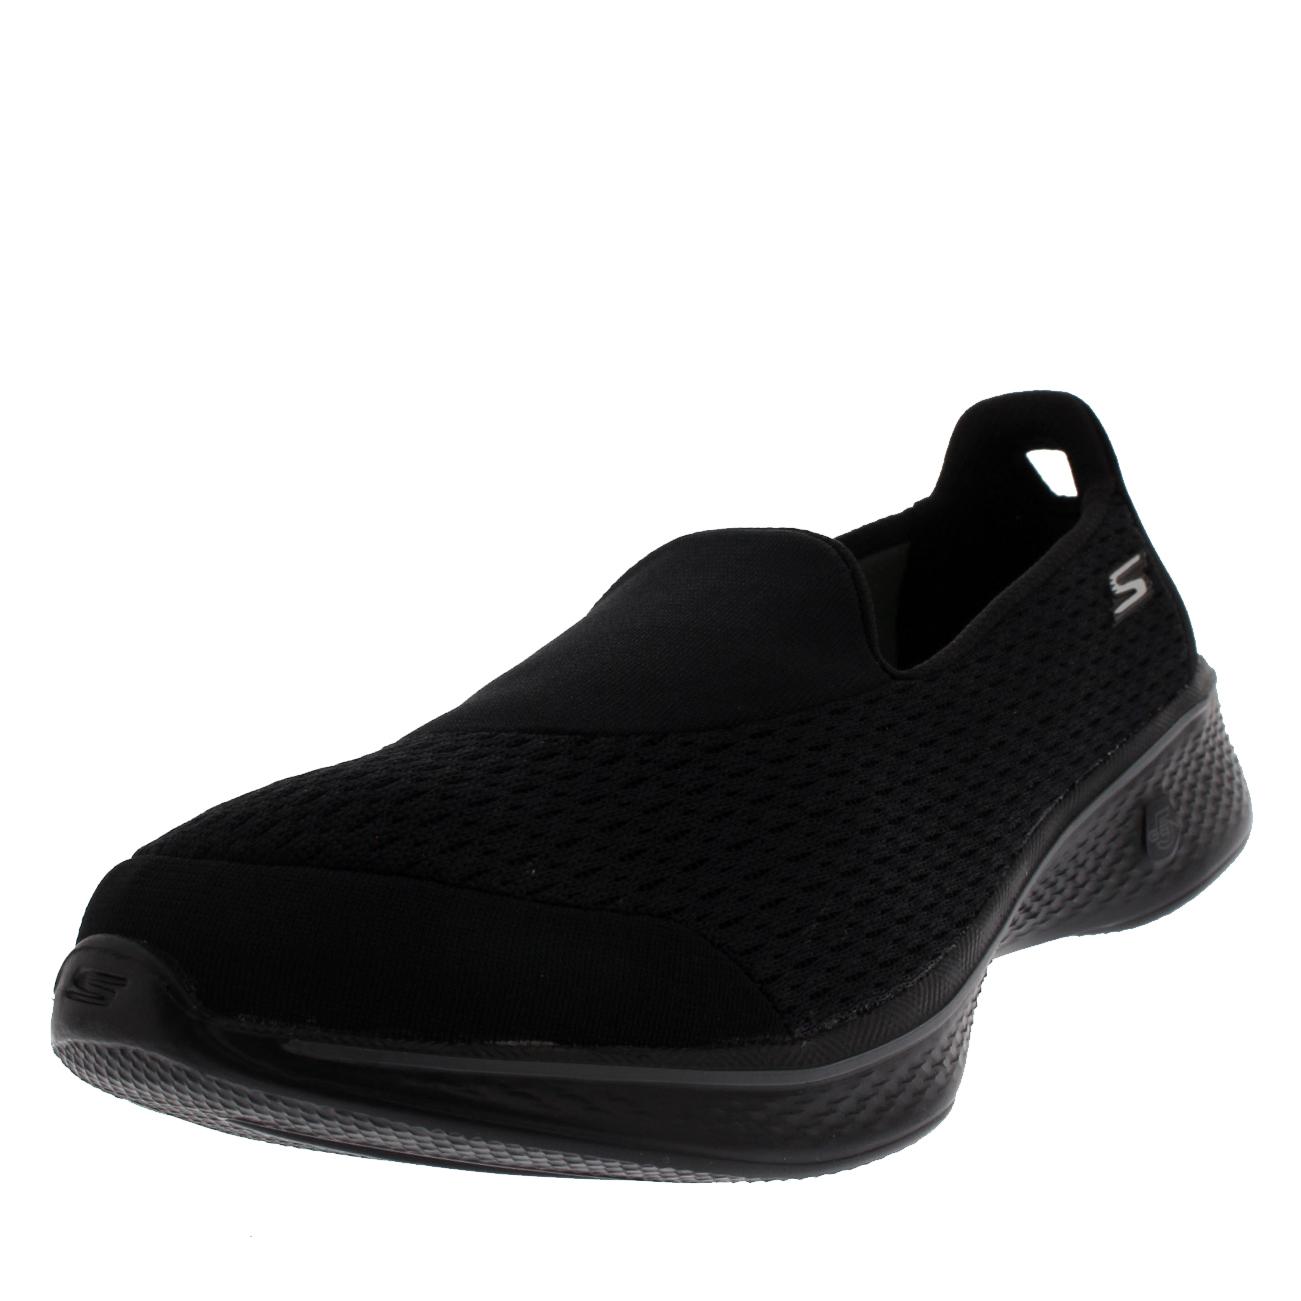 Damen Skechers Go Go Go Walk 4 PurAnzug Gehen Yoga Leicht Mesh Turnschuhe EU 36-41  | Moderne und stilvolle Mode  43cdde